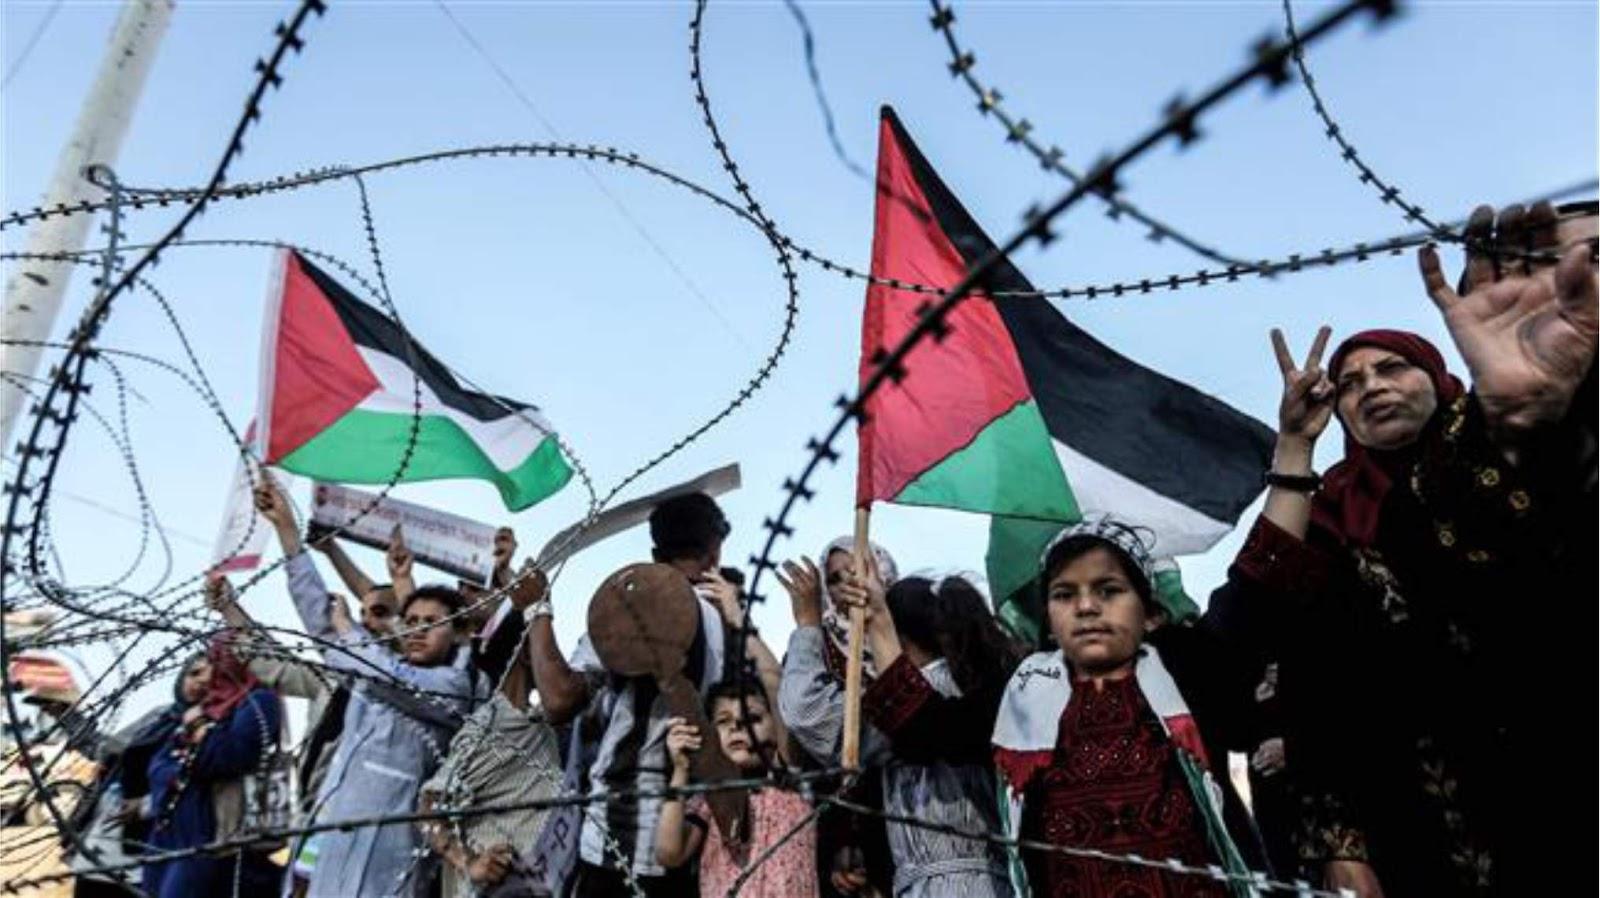 Palestina menolak kesepakatan abad ini Amerika Serikat dan mengandalkan Rusia